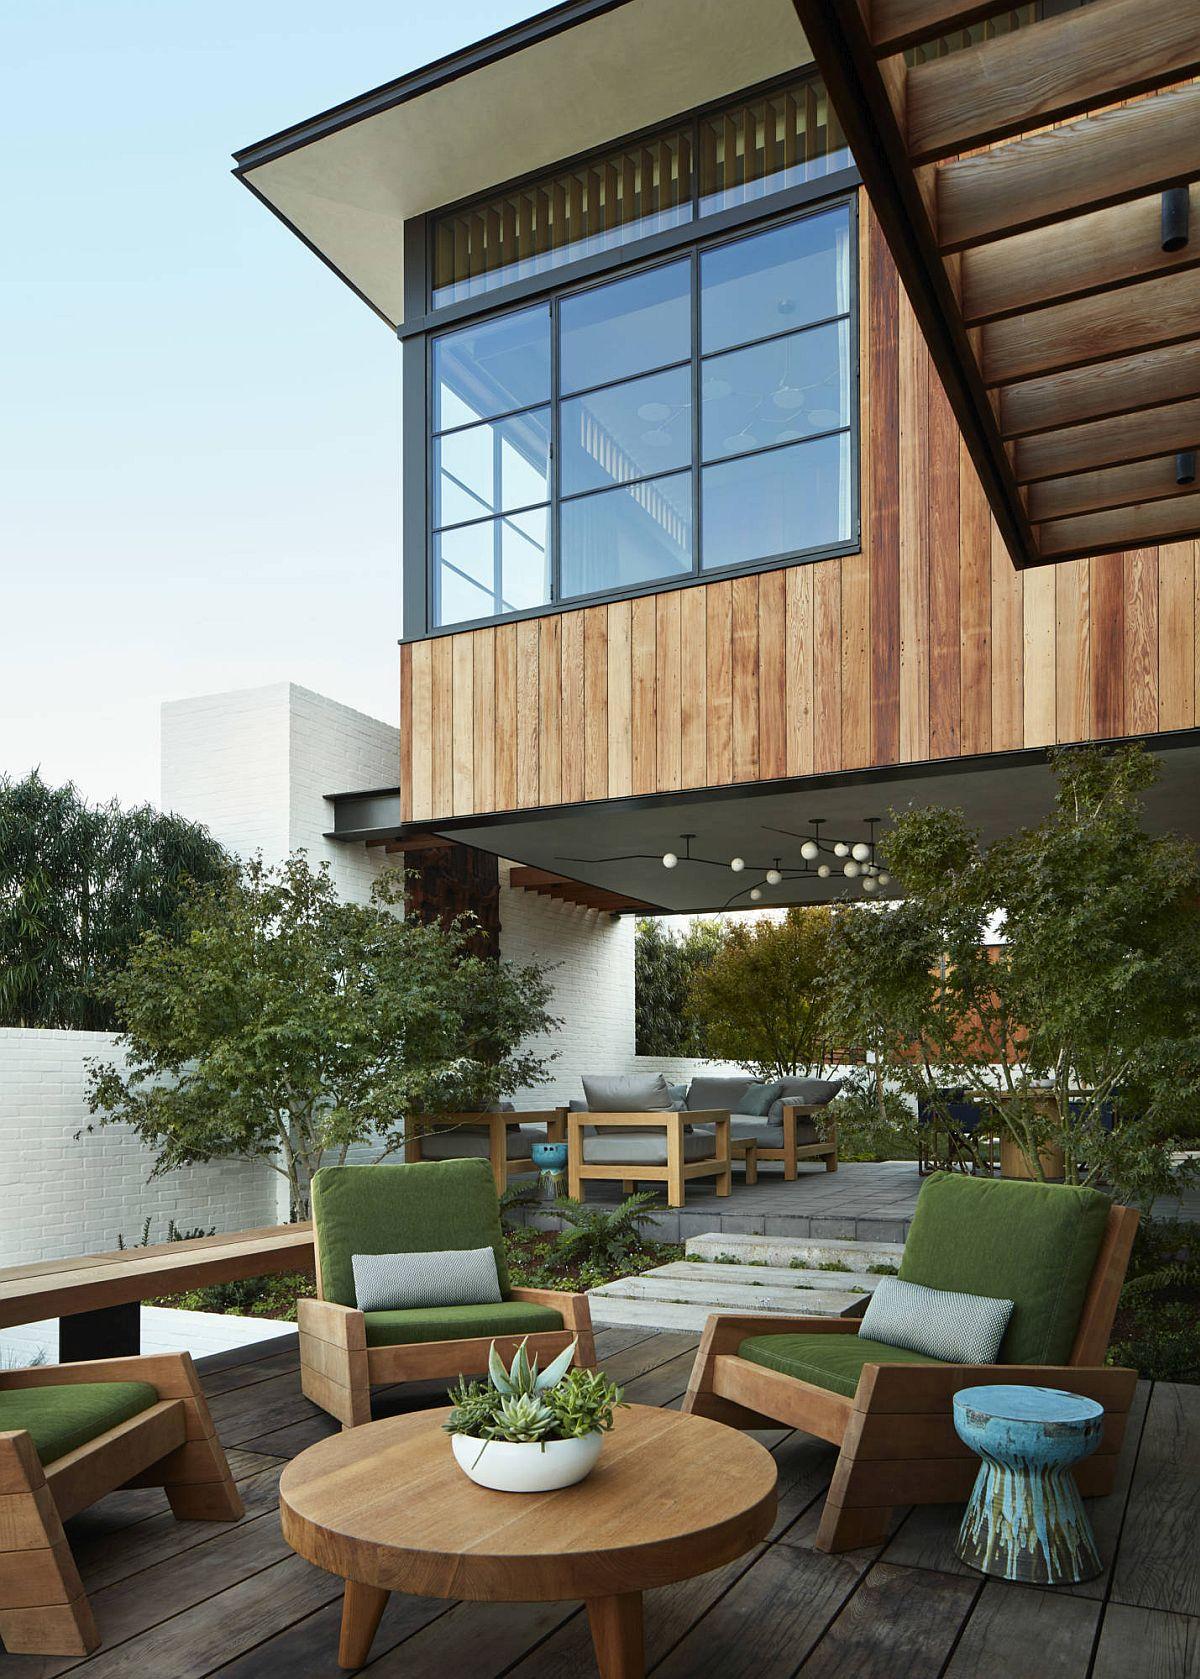 Modern-Urban-Retreat-in-San-Francisco-with-an-eco-freindly-design-26526